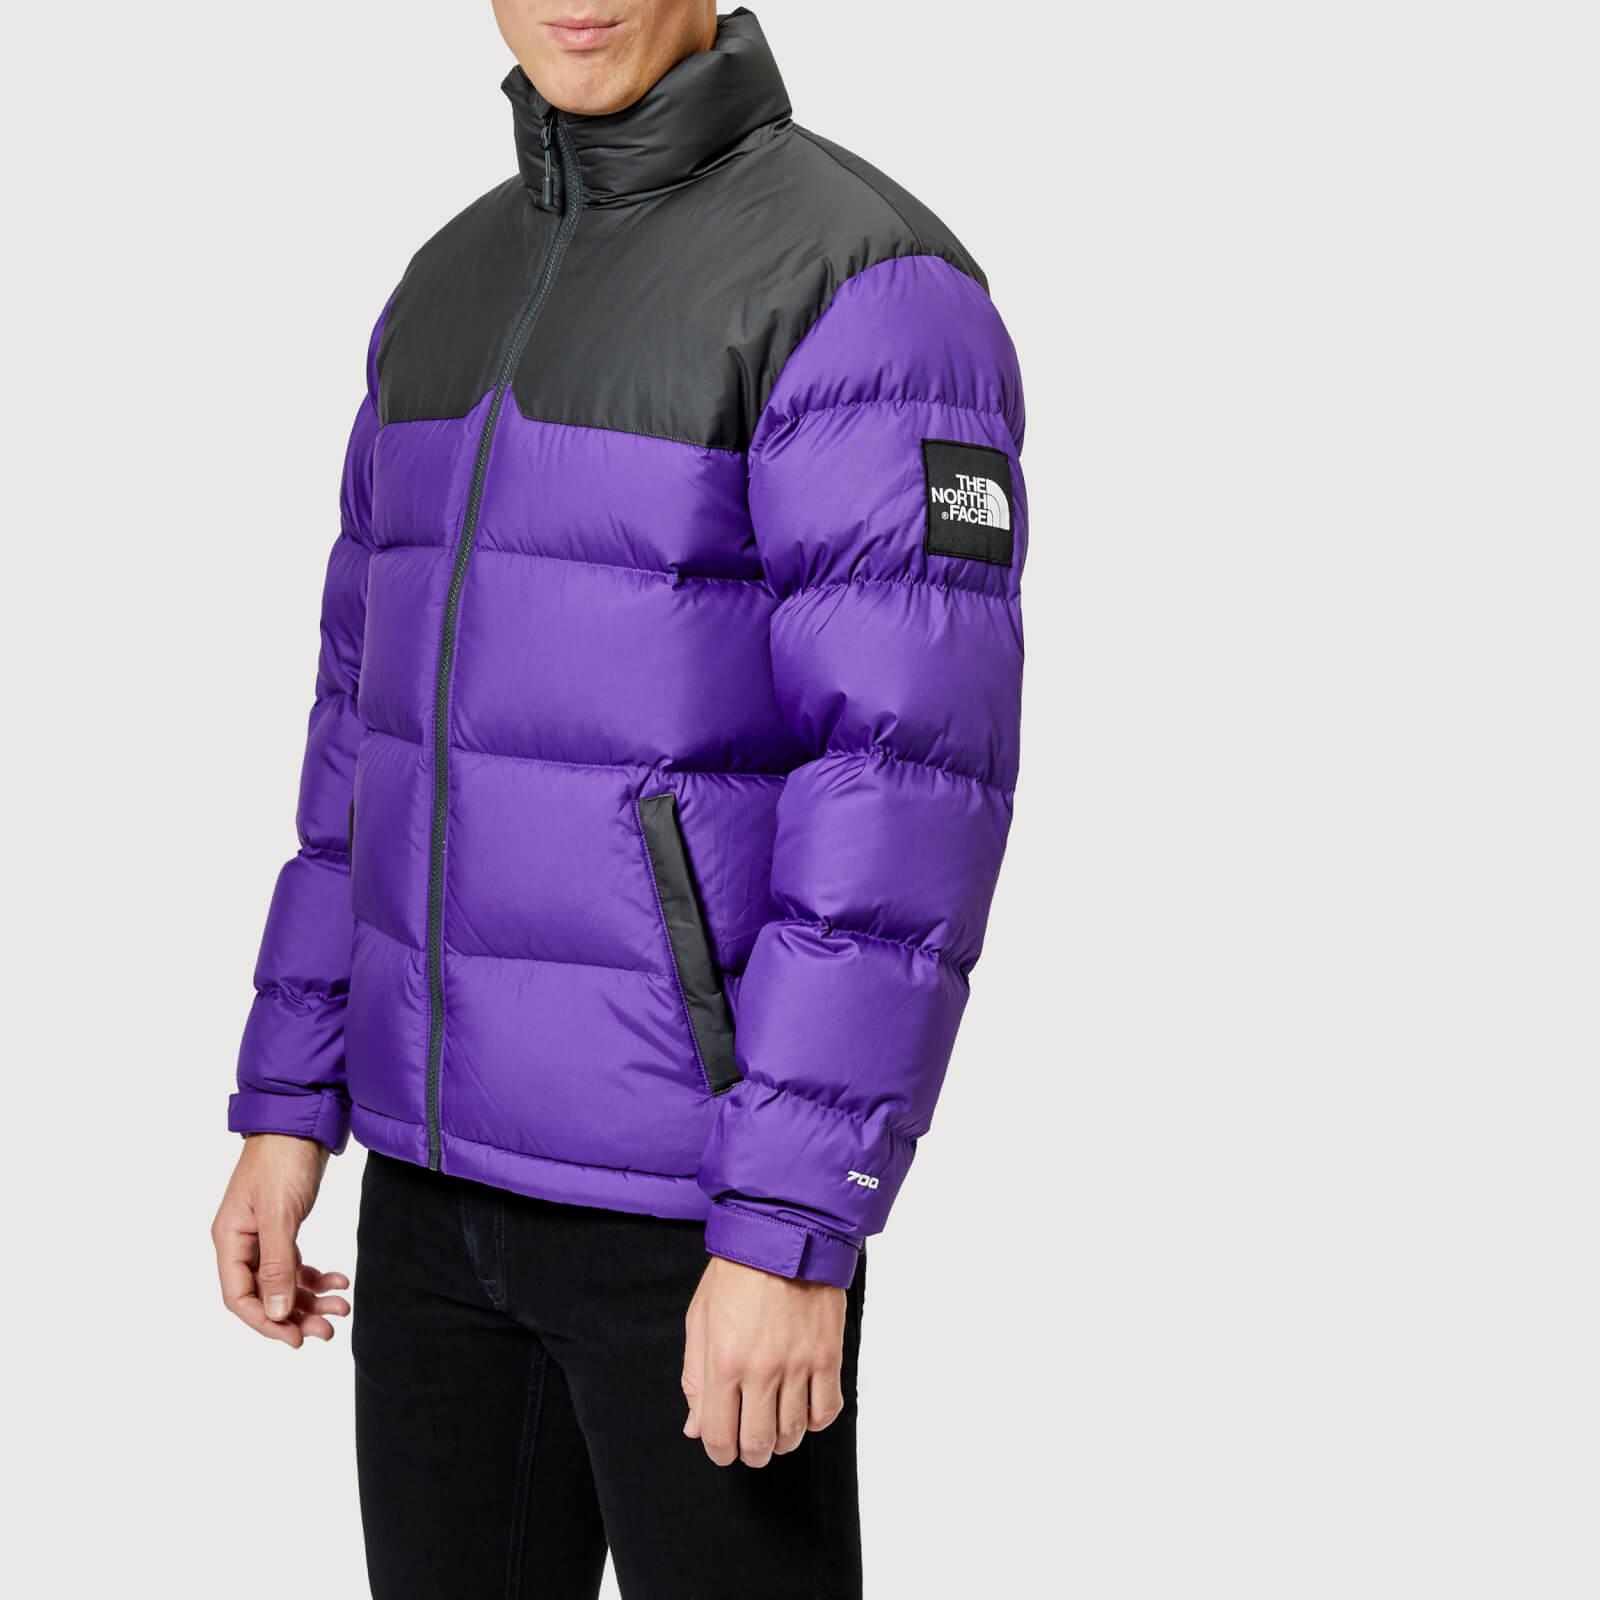 970087c36 The North Face Men's 1992 Nuptse Jacket - Tillandsiapurple/Asphalt Grey